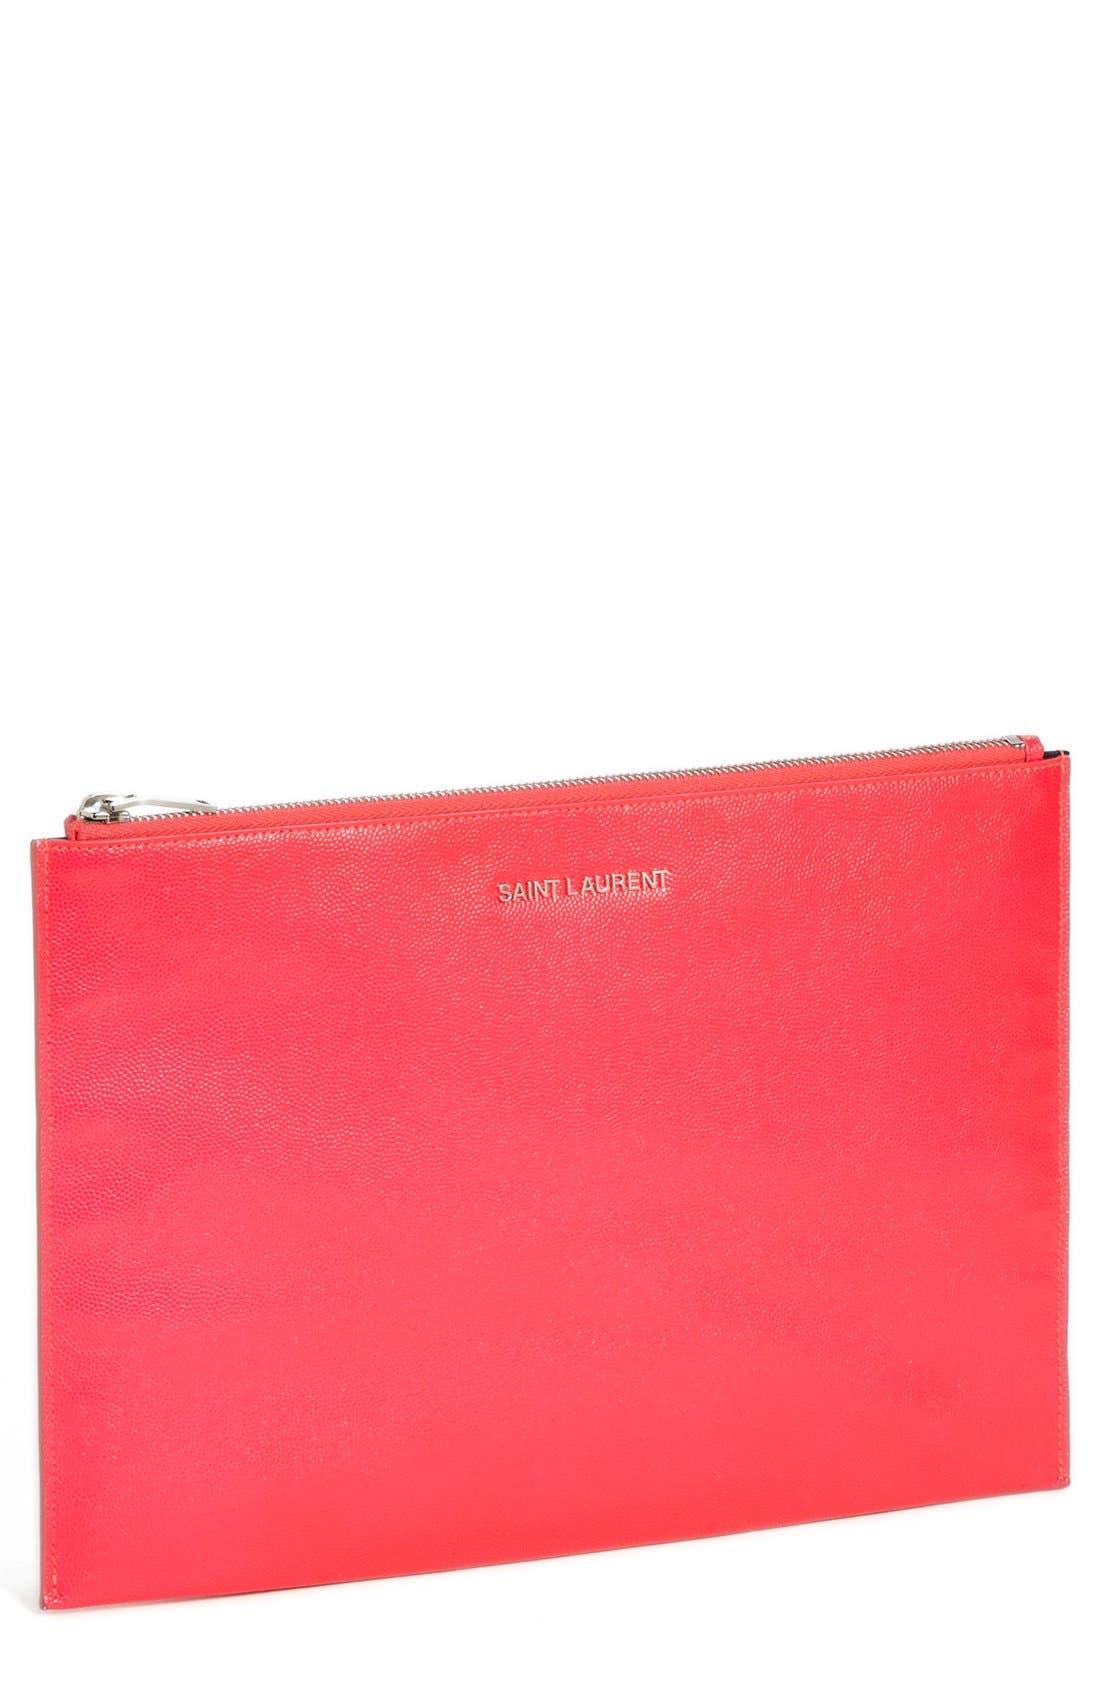 Alternate Image 1 Selected - Saint Laurent 'Letters' Zip Clutch